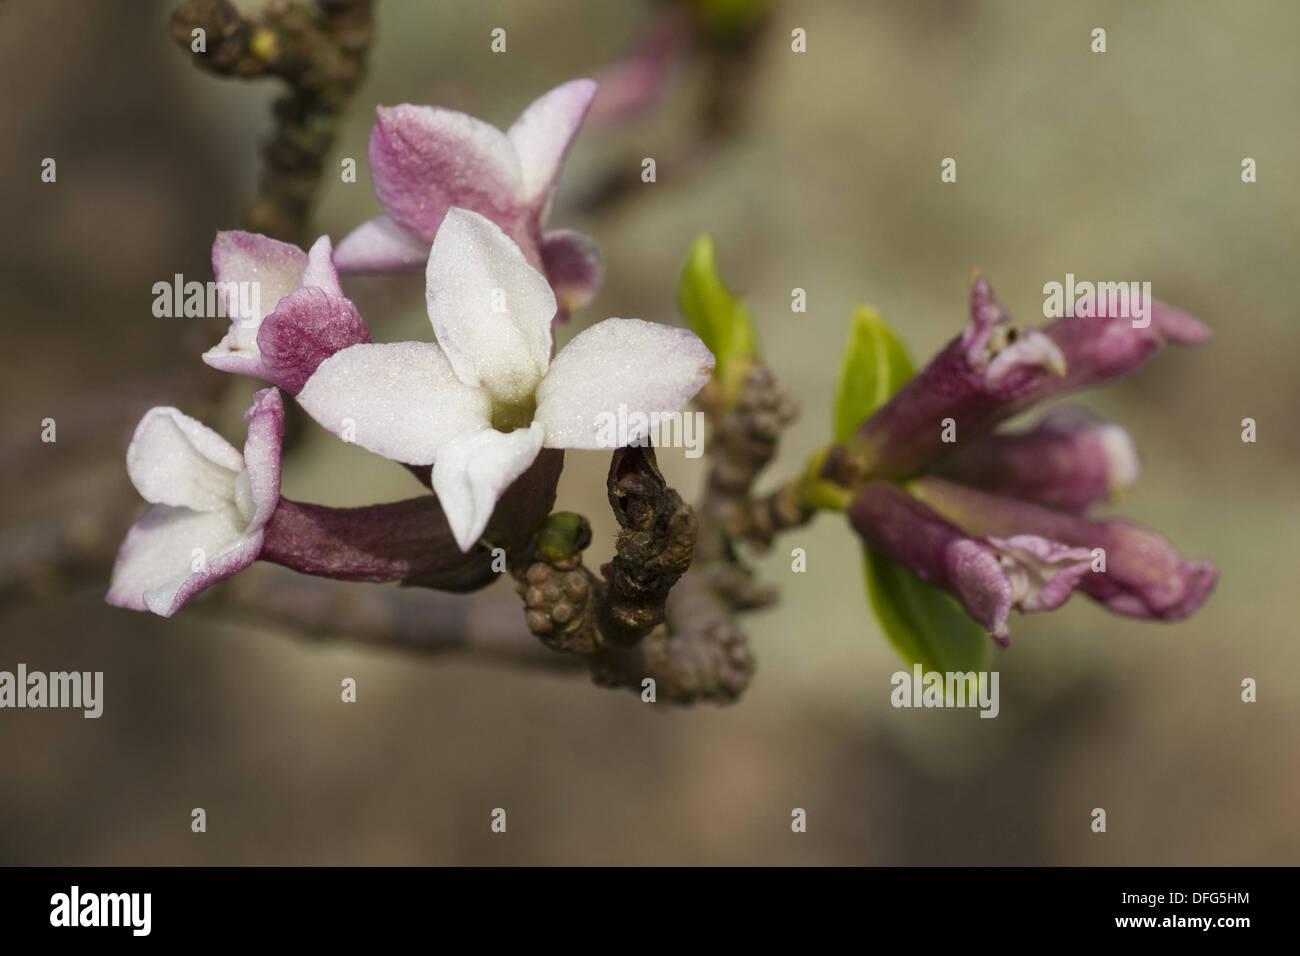 daphne - Stock Image